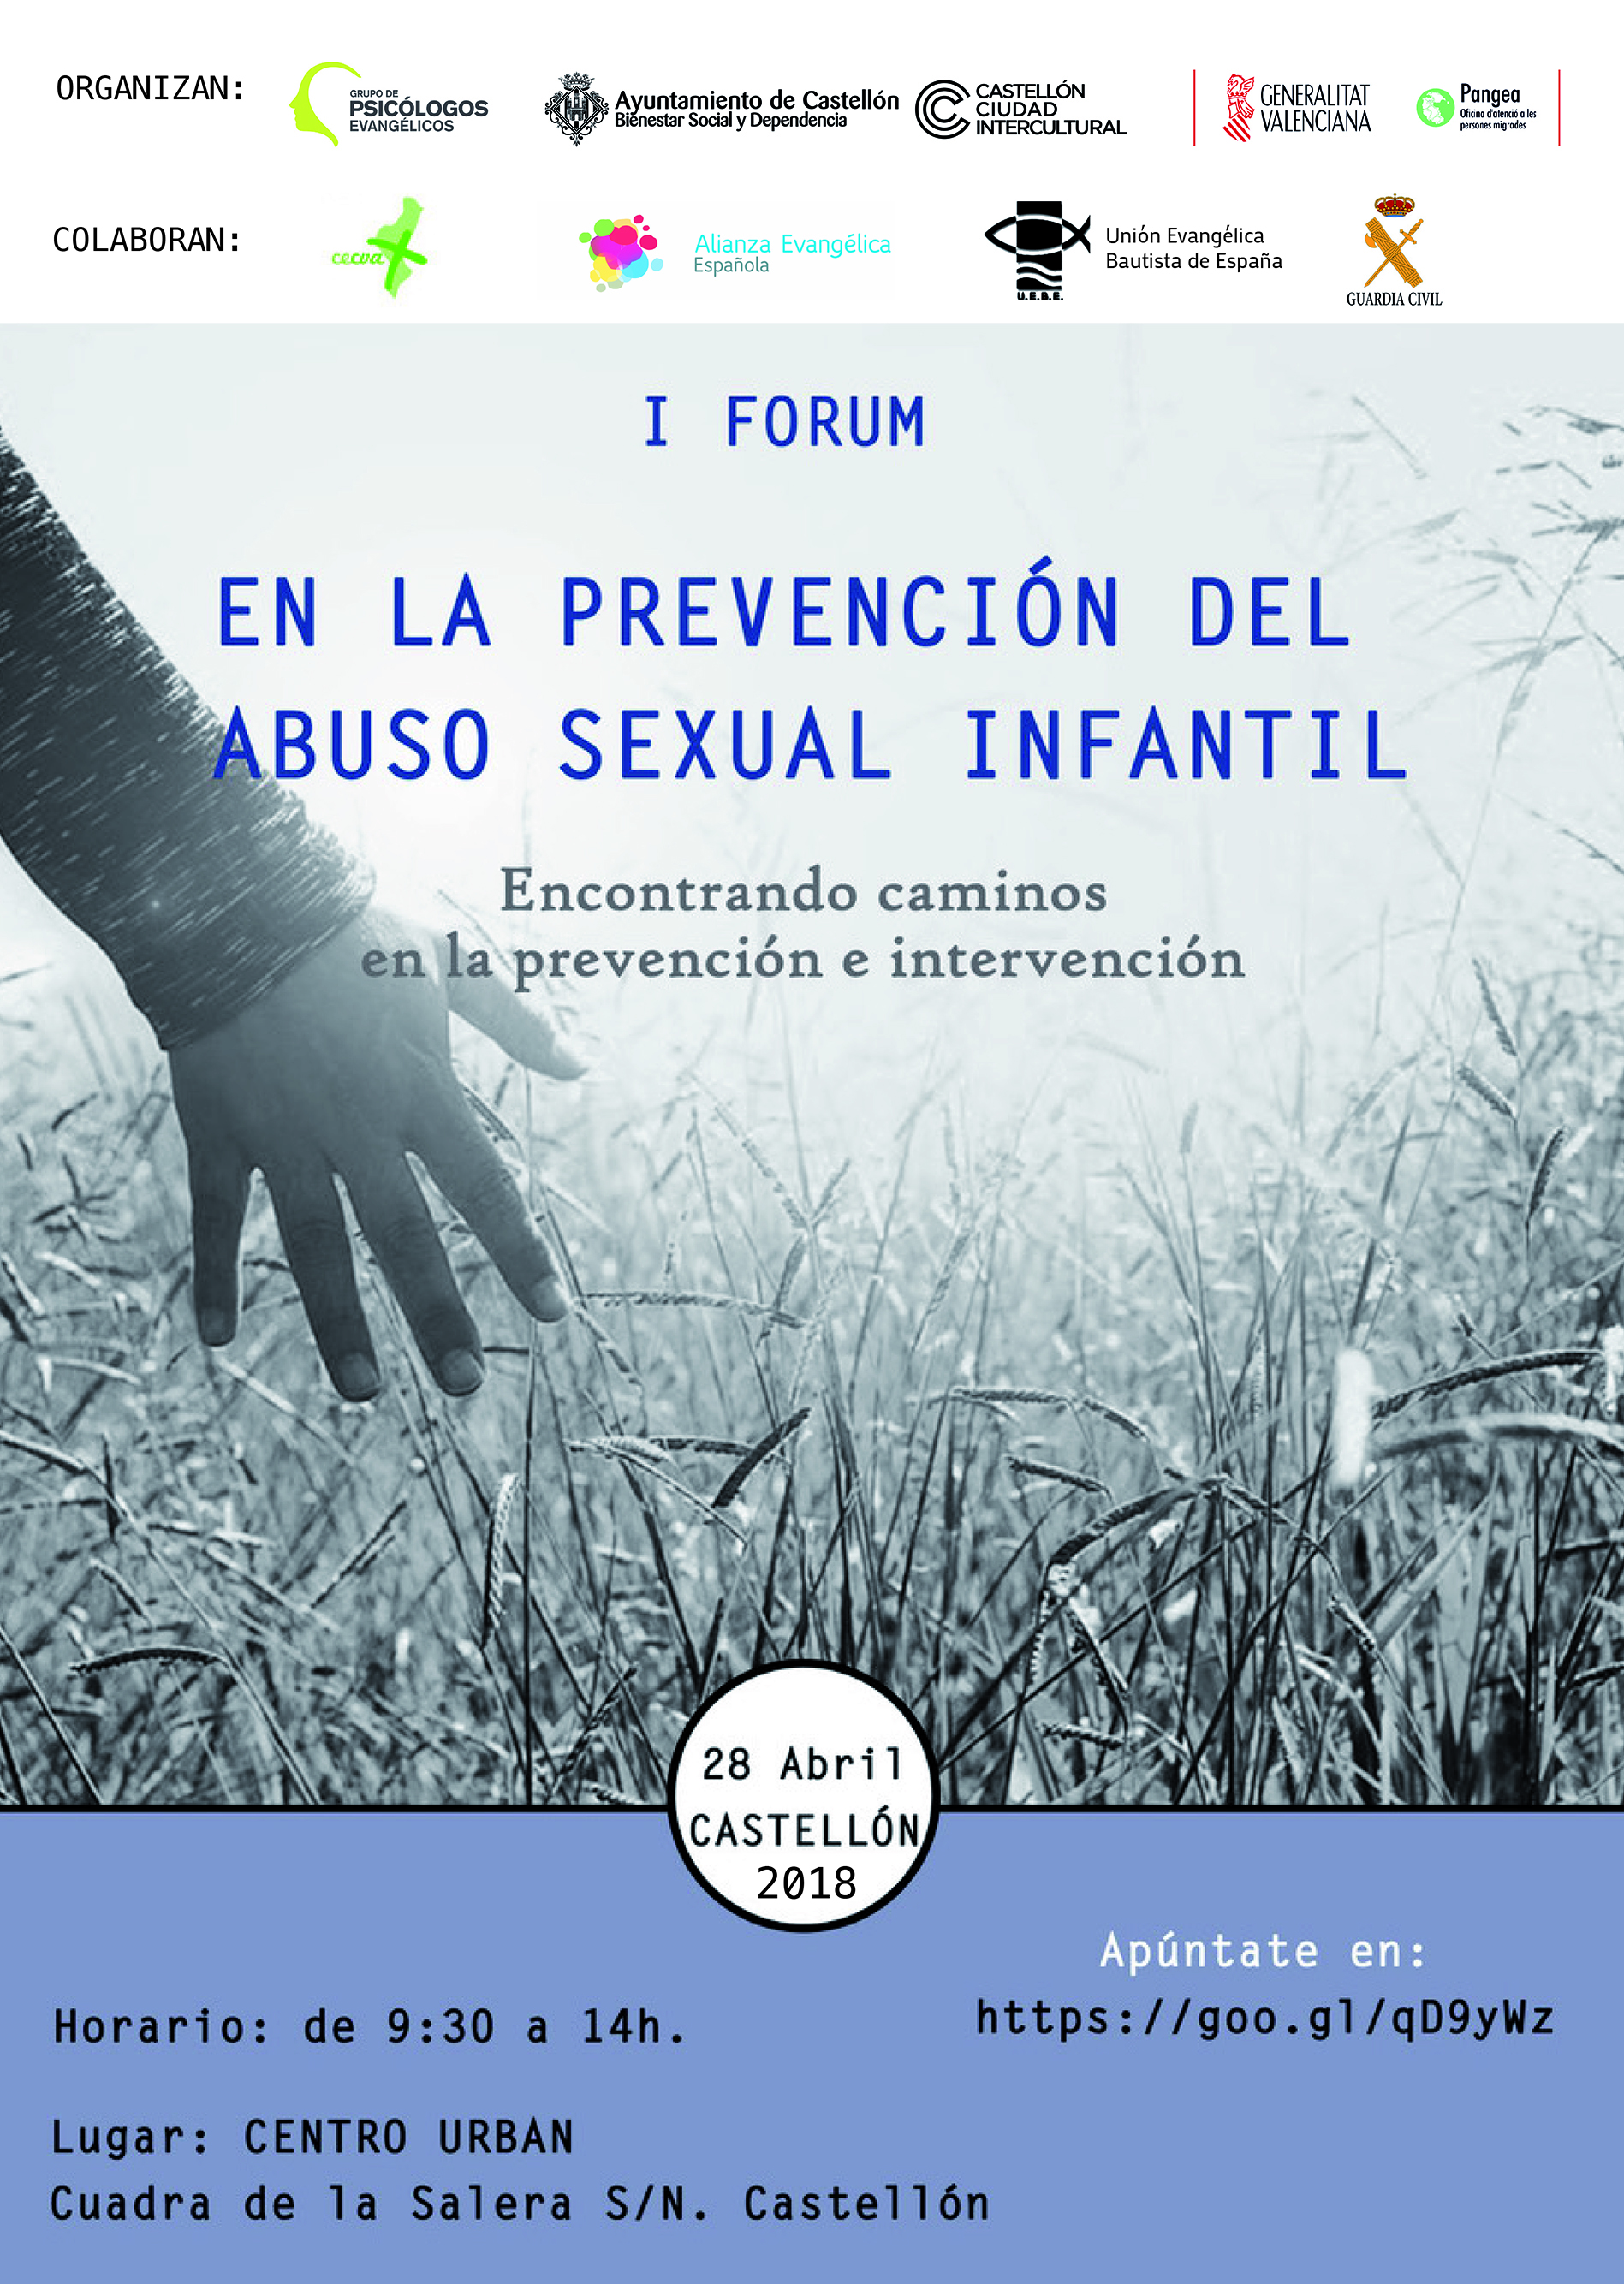 foro-prevencion-abusos-sexuales-infantiles